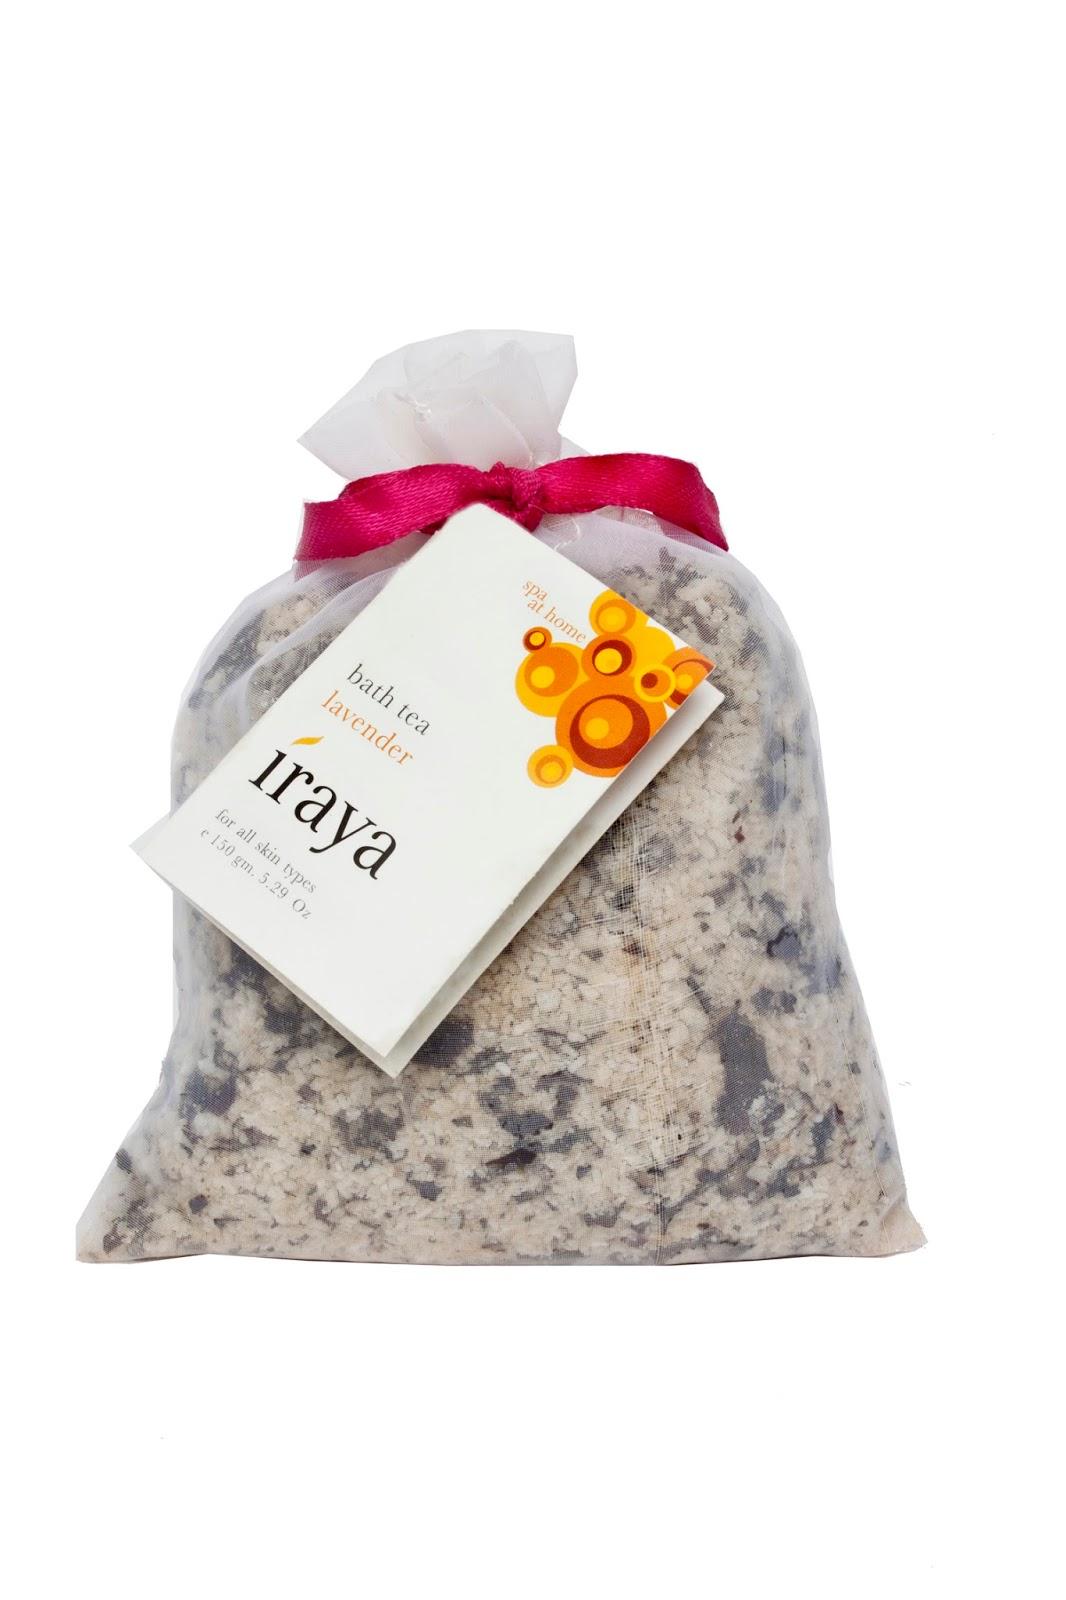 Iraya Bath Tea Lavender